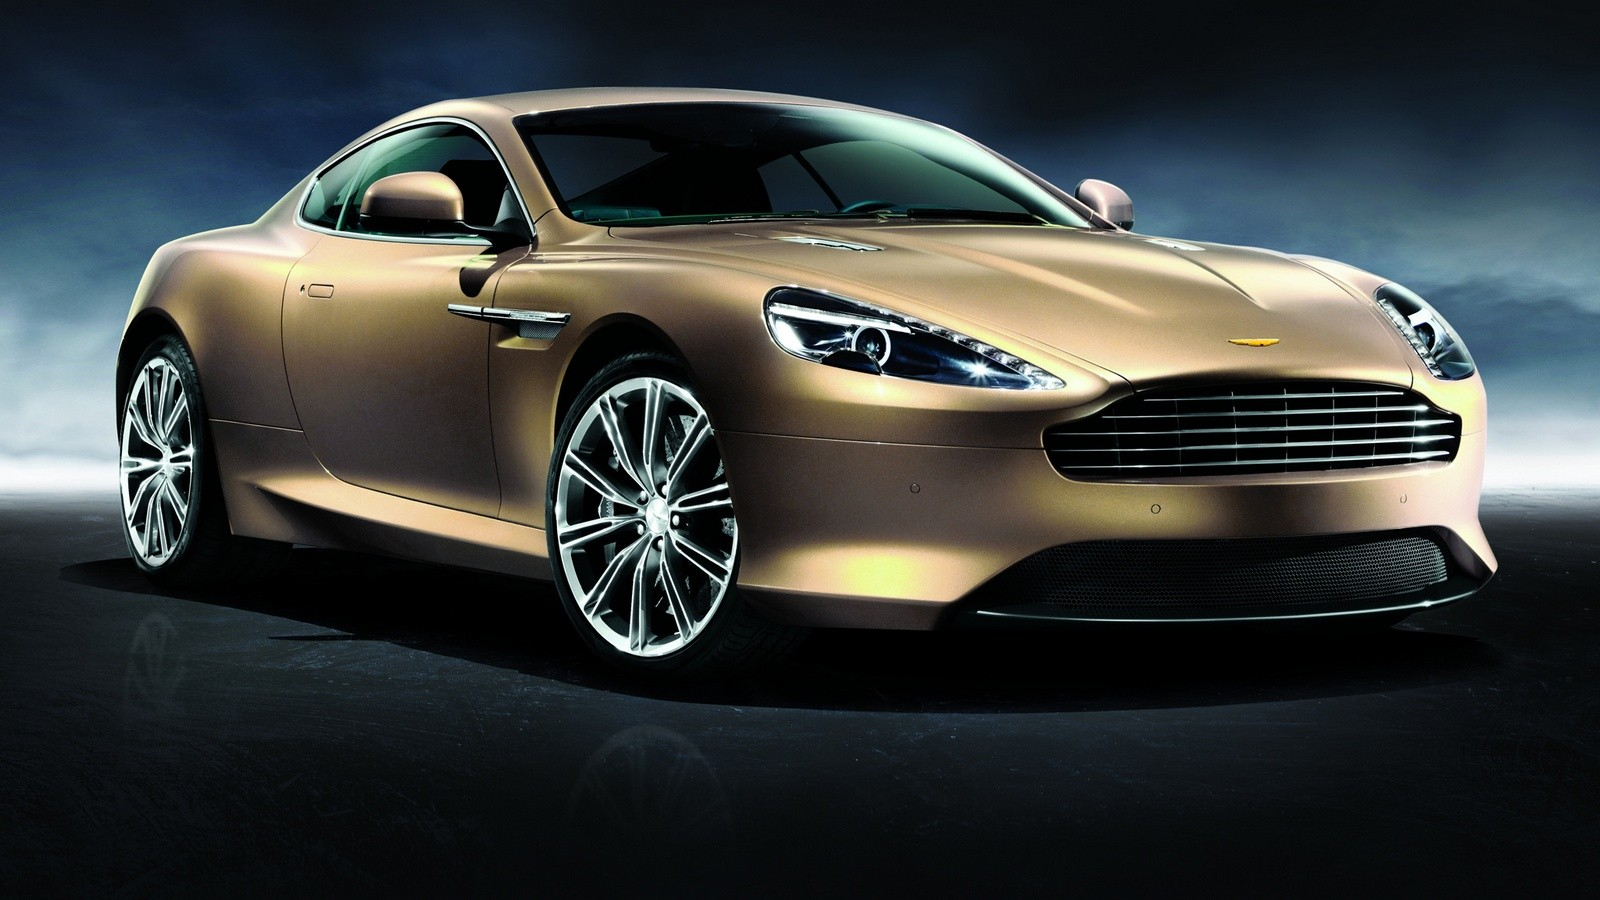 На фото: Aston Martin Virage Dragon 88 '2012